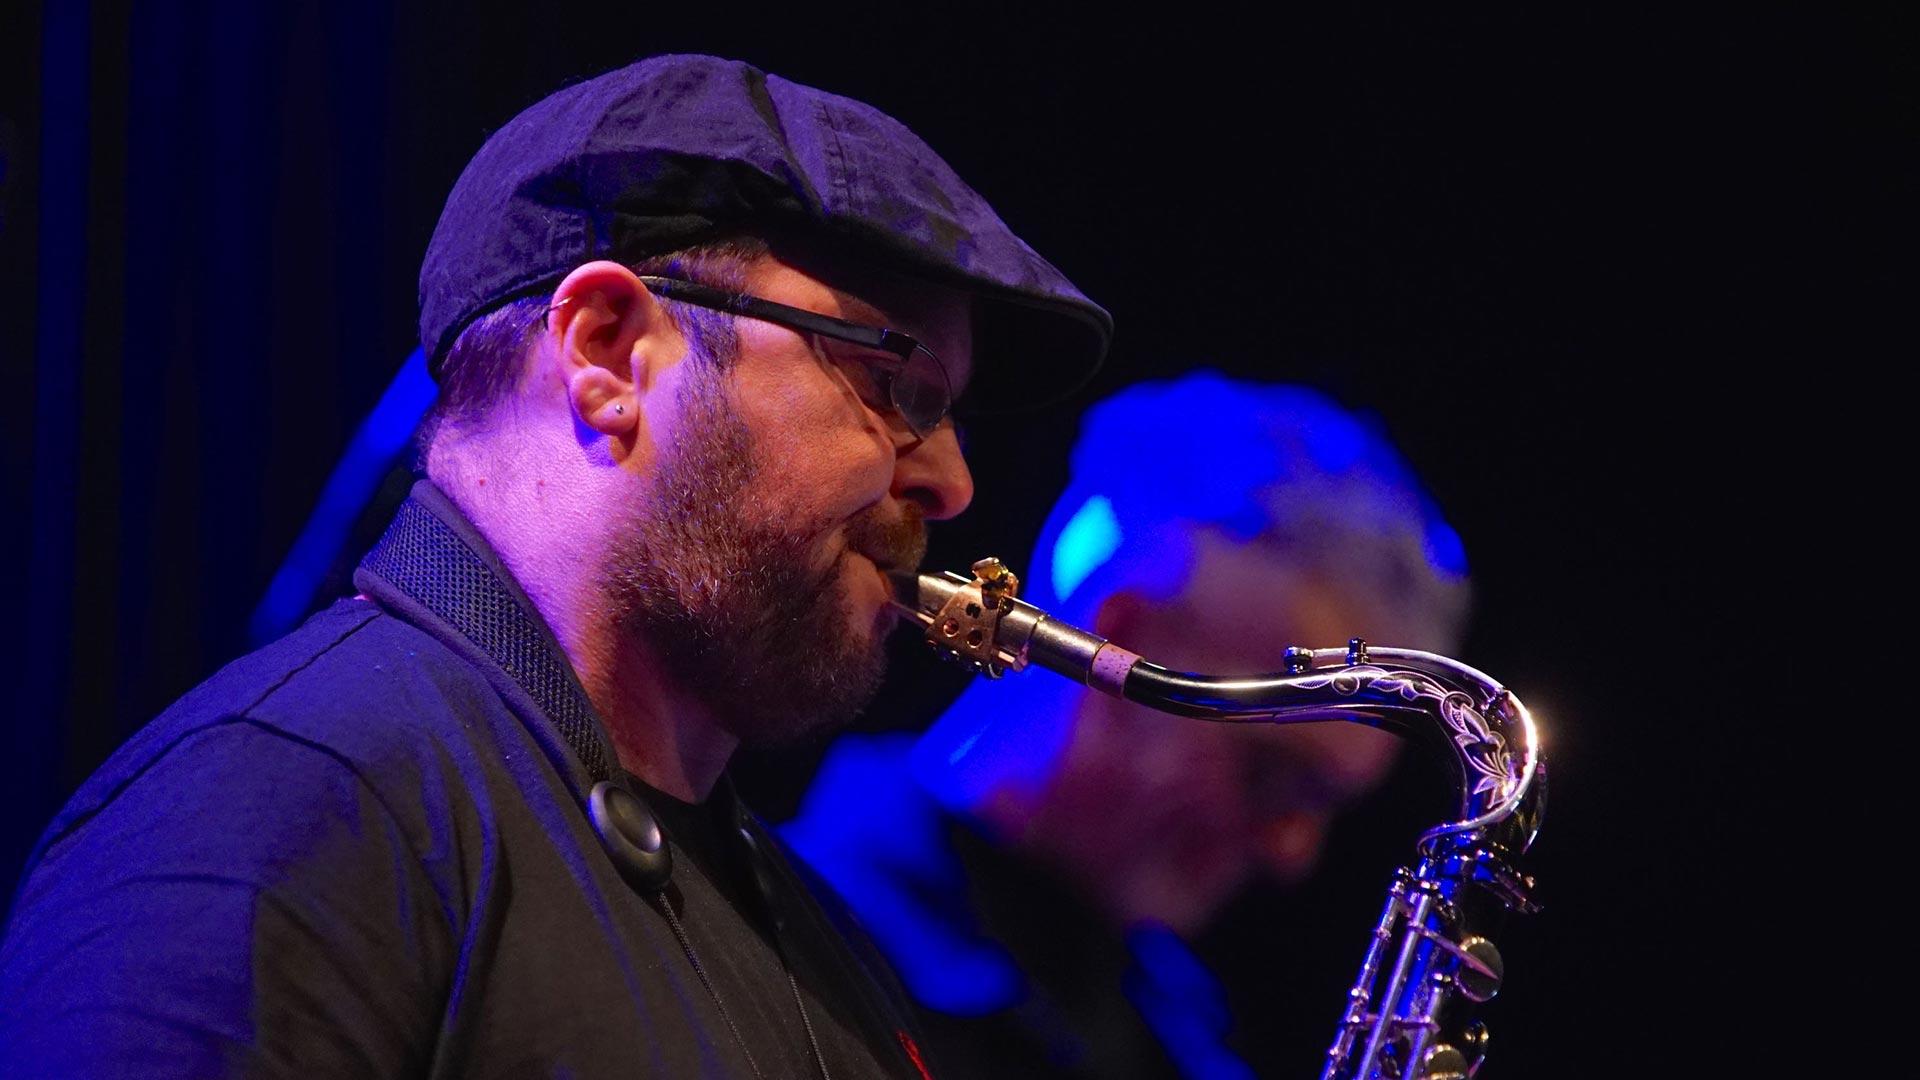 Close up of Chris Aldridge playing sax wearing a flat cap